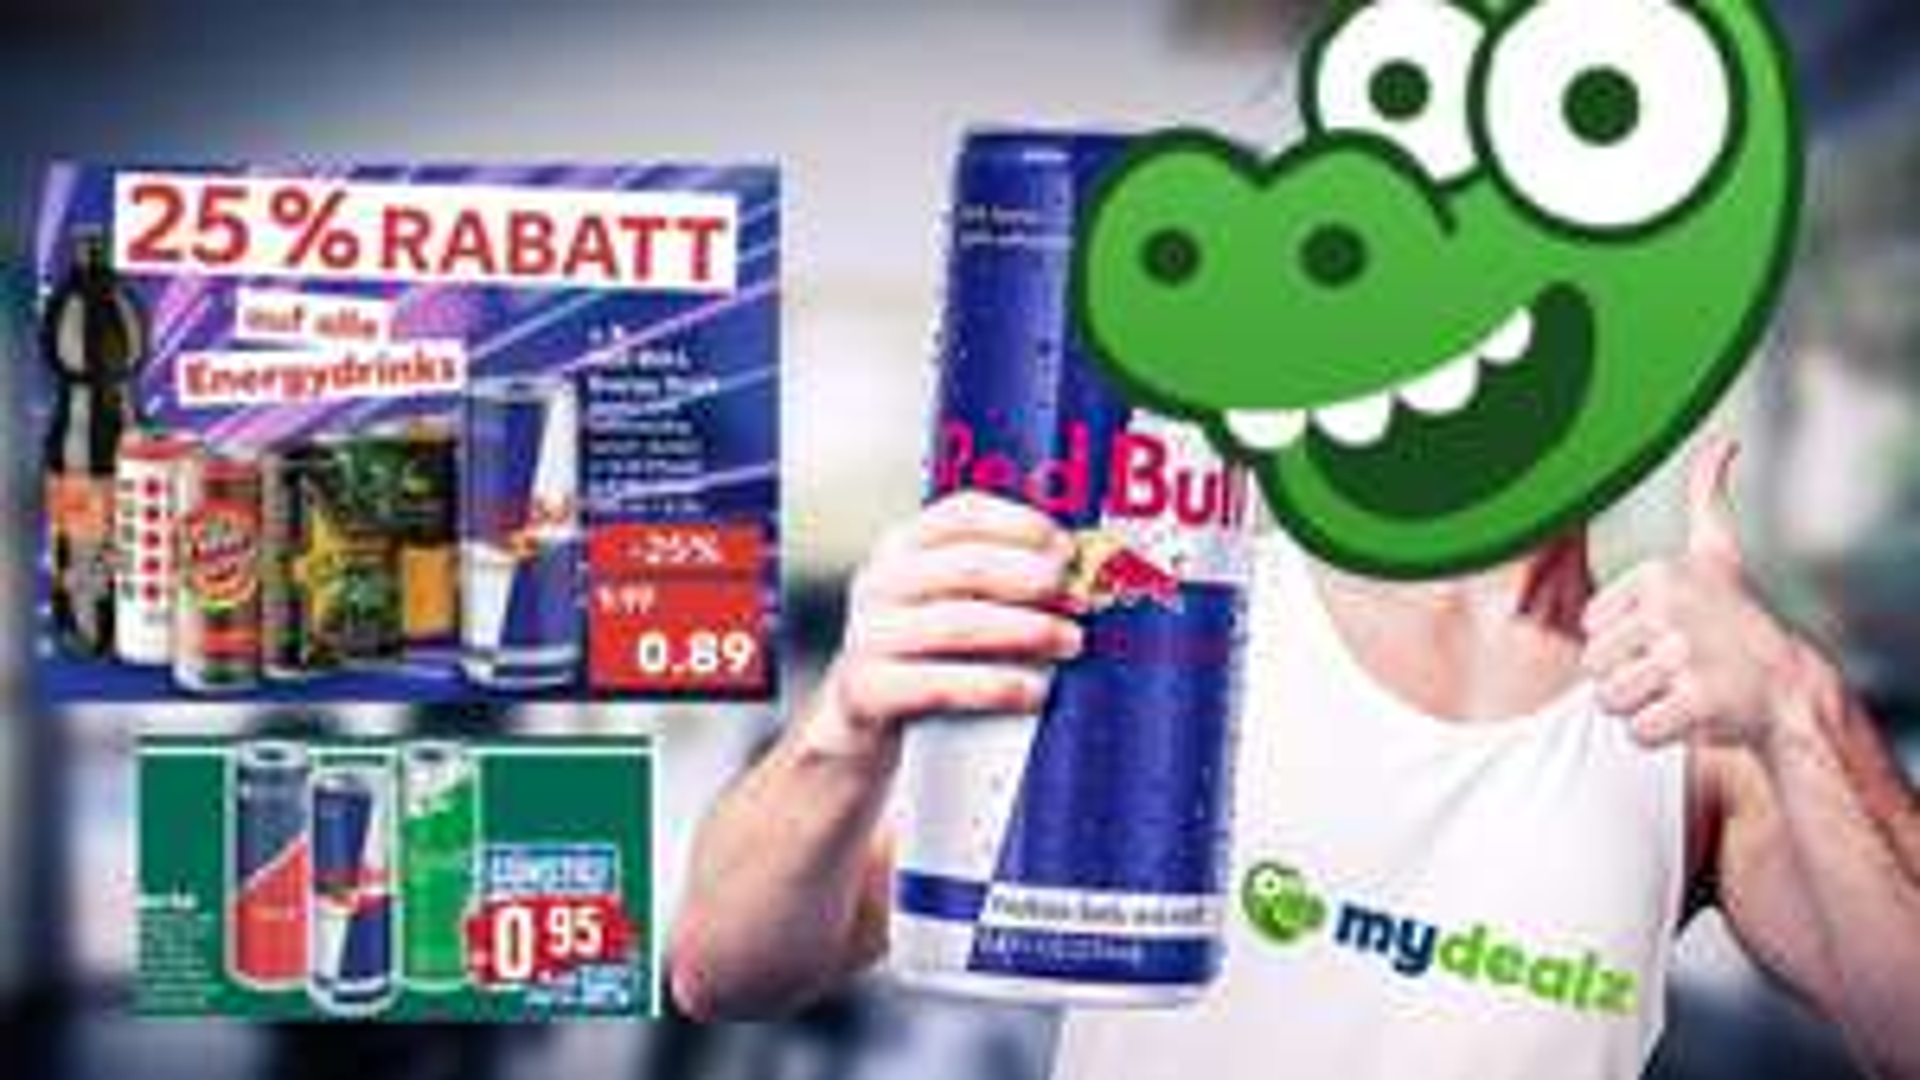 Energy Drink Angebote vom 17.05 - 22.05 z.B Red Bull Energy Drink für 0.89€